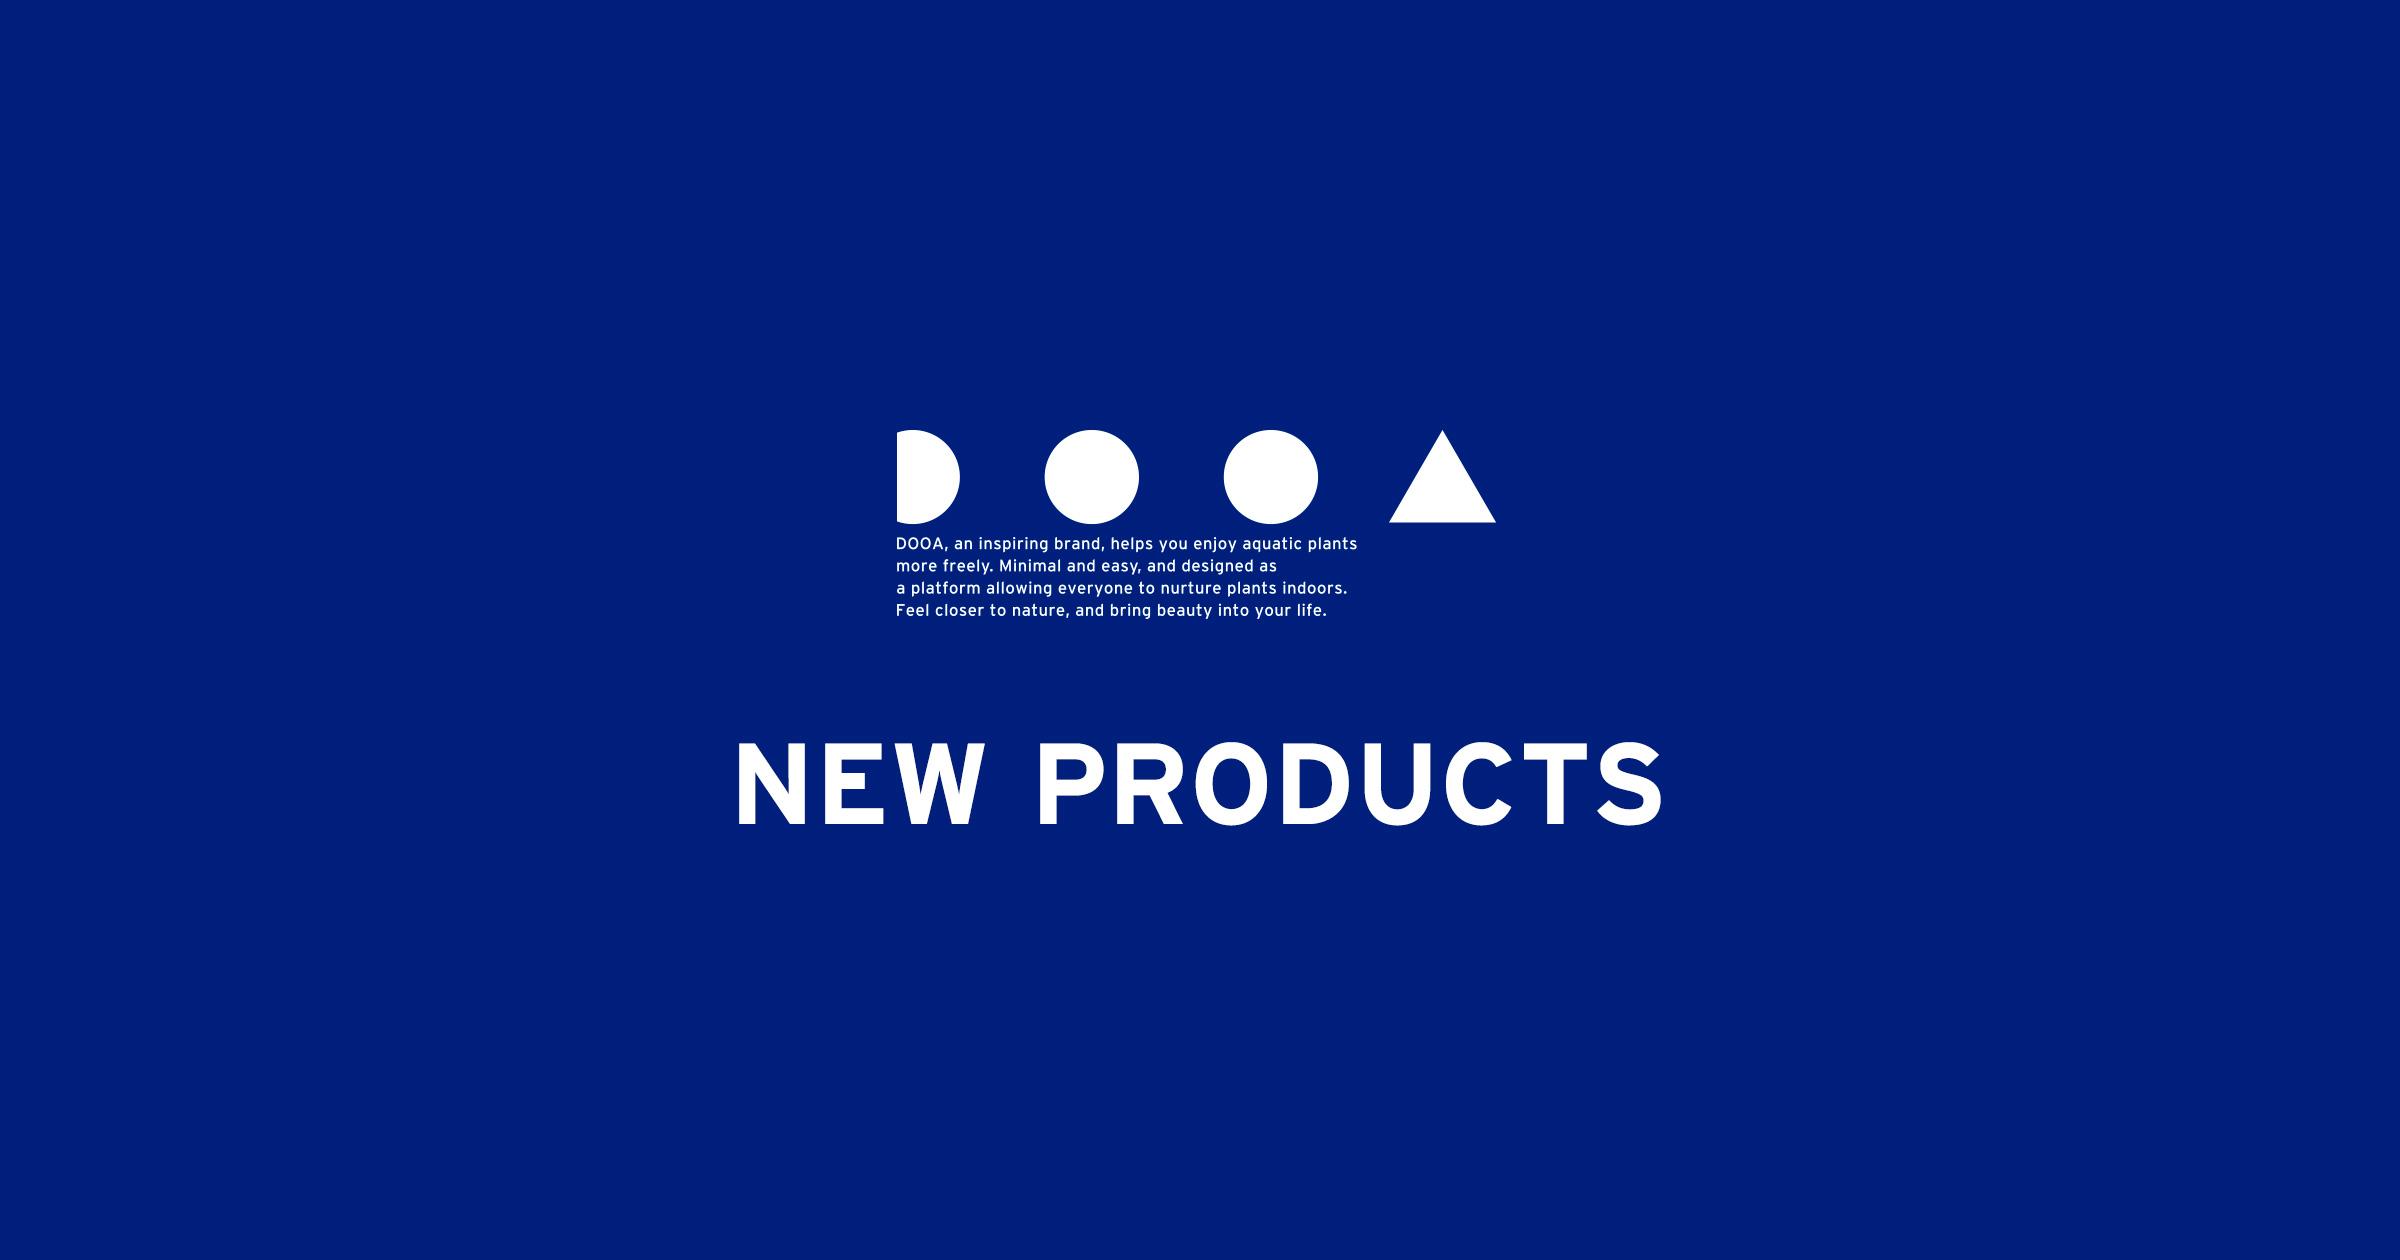 DOOA NEW PRODUCTS 'More Fun with DOOA's New Ideas'